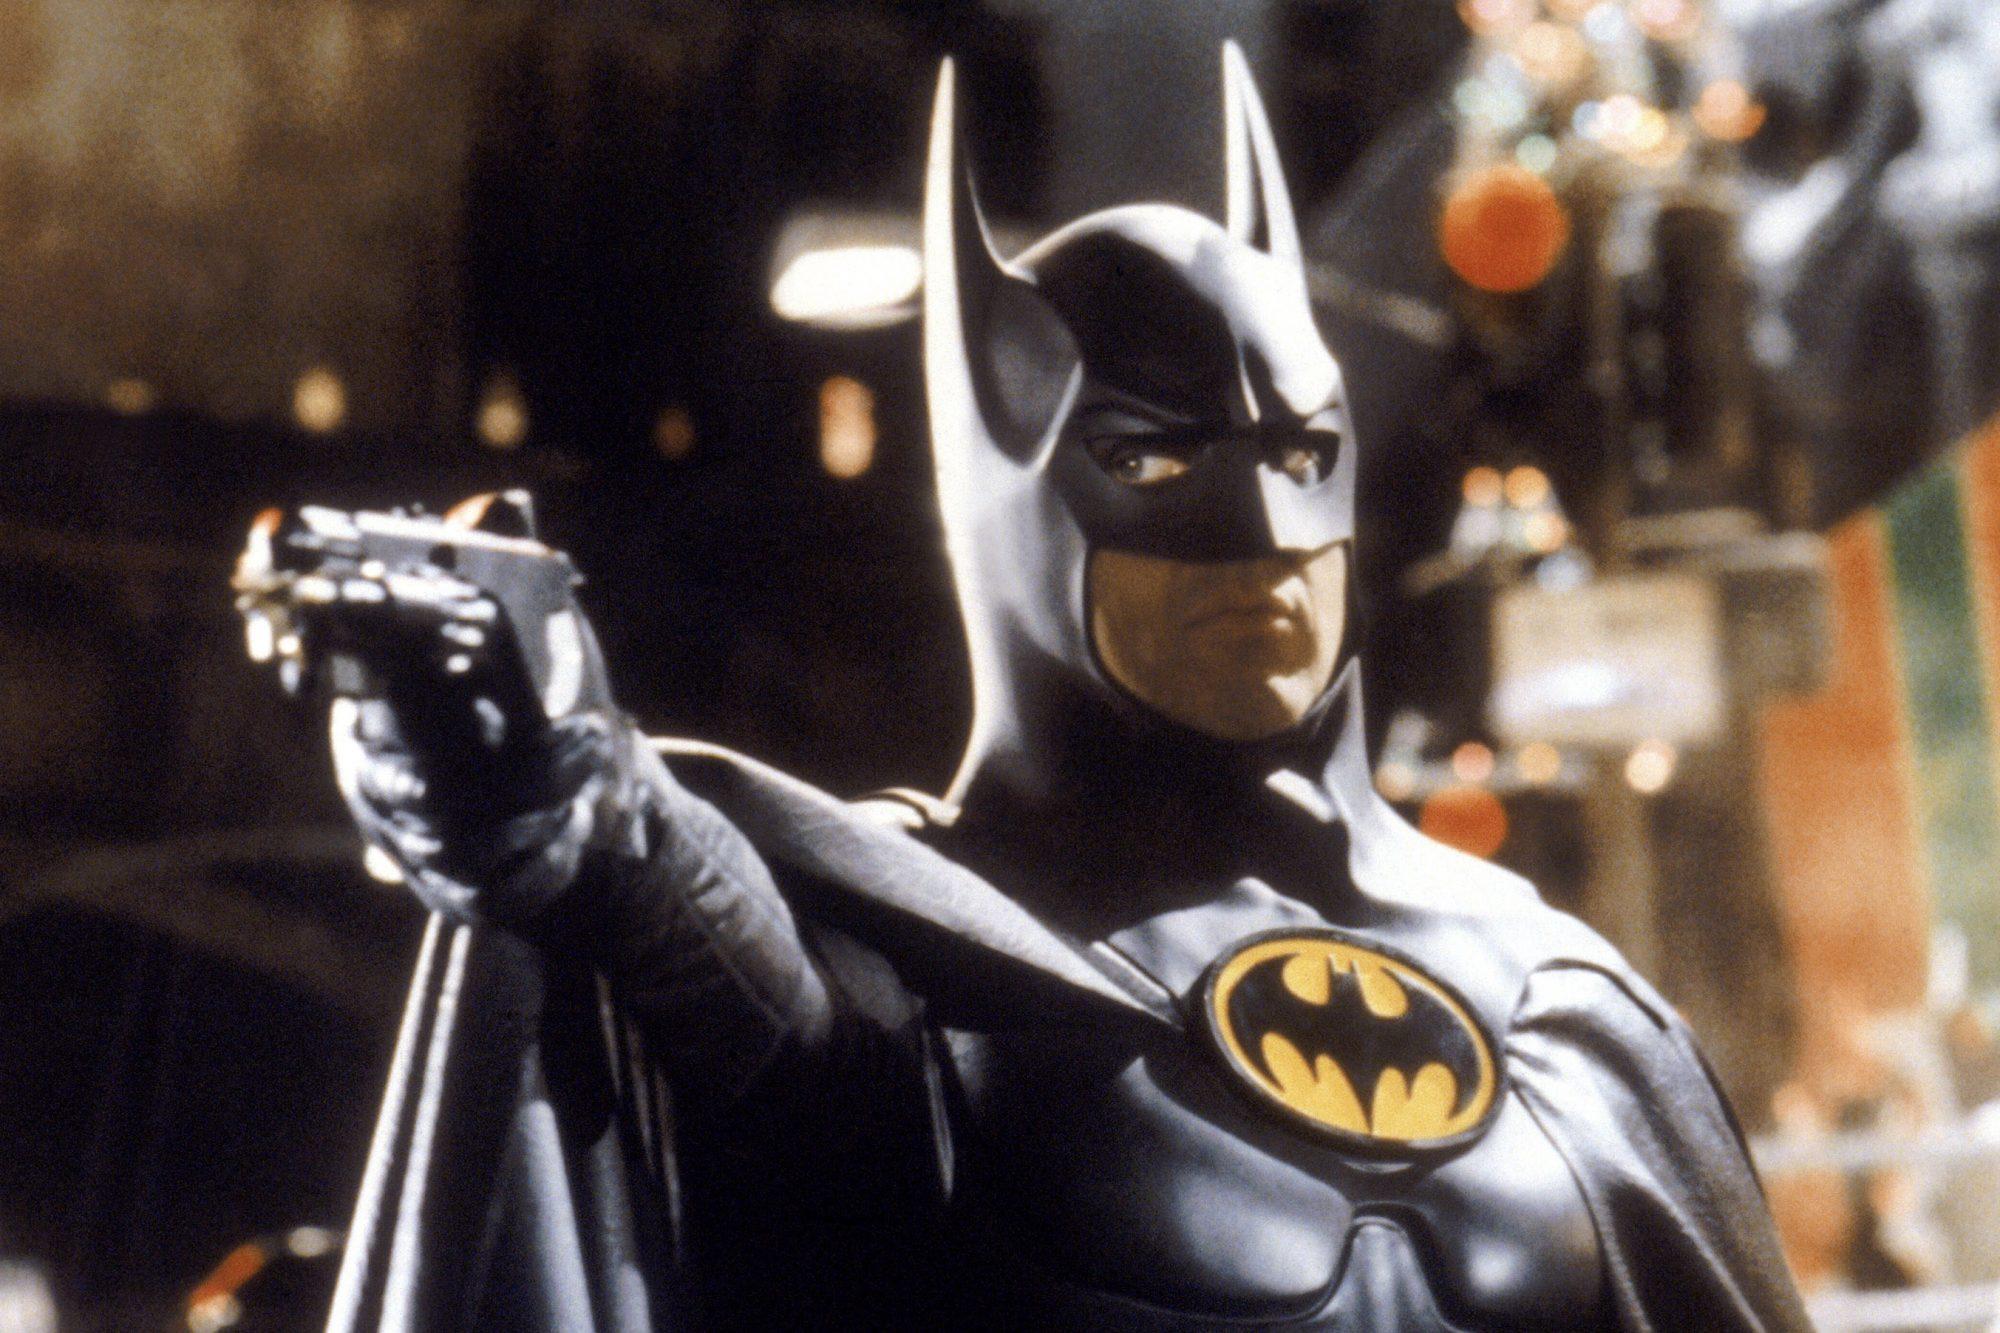 Michael Keaton may return as Batman in 'The Flash' film